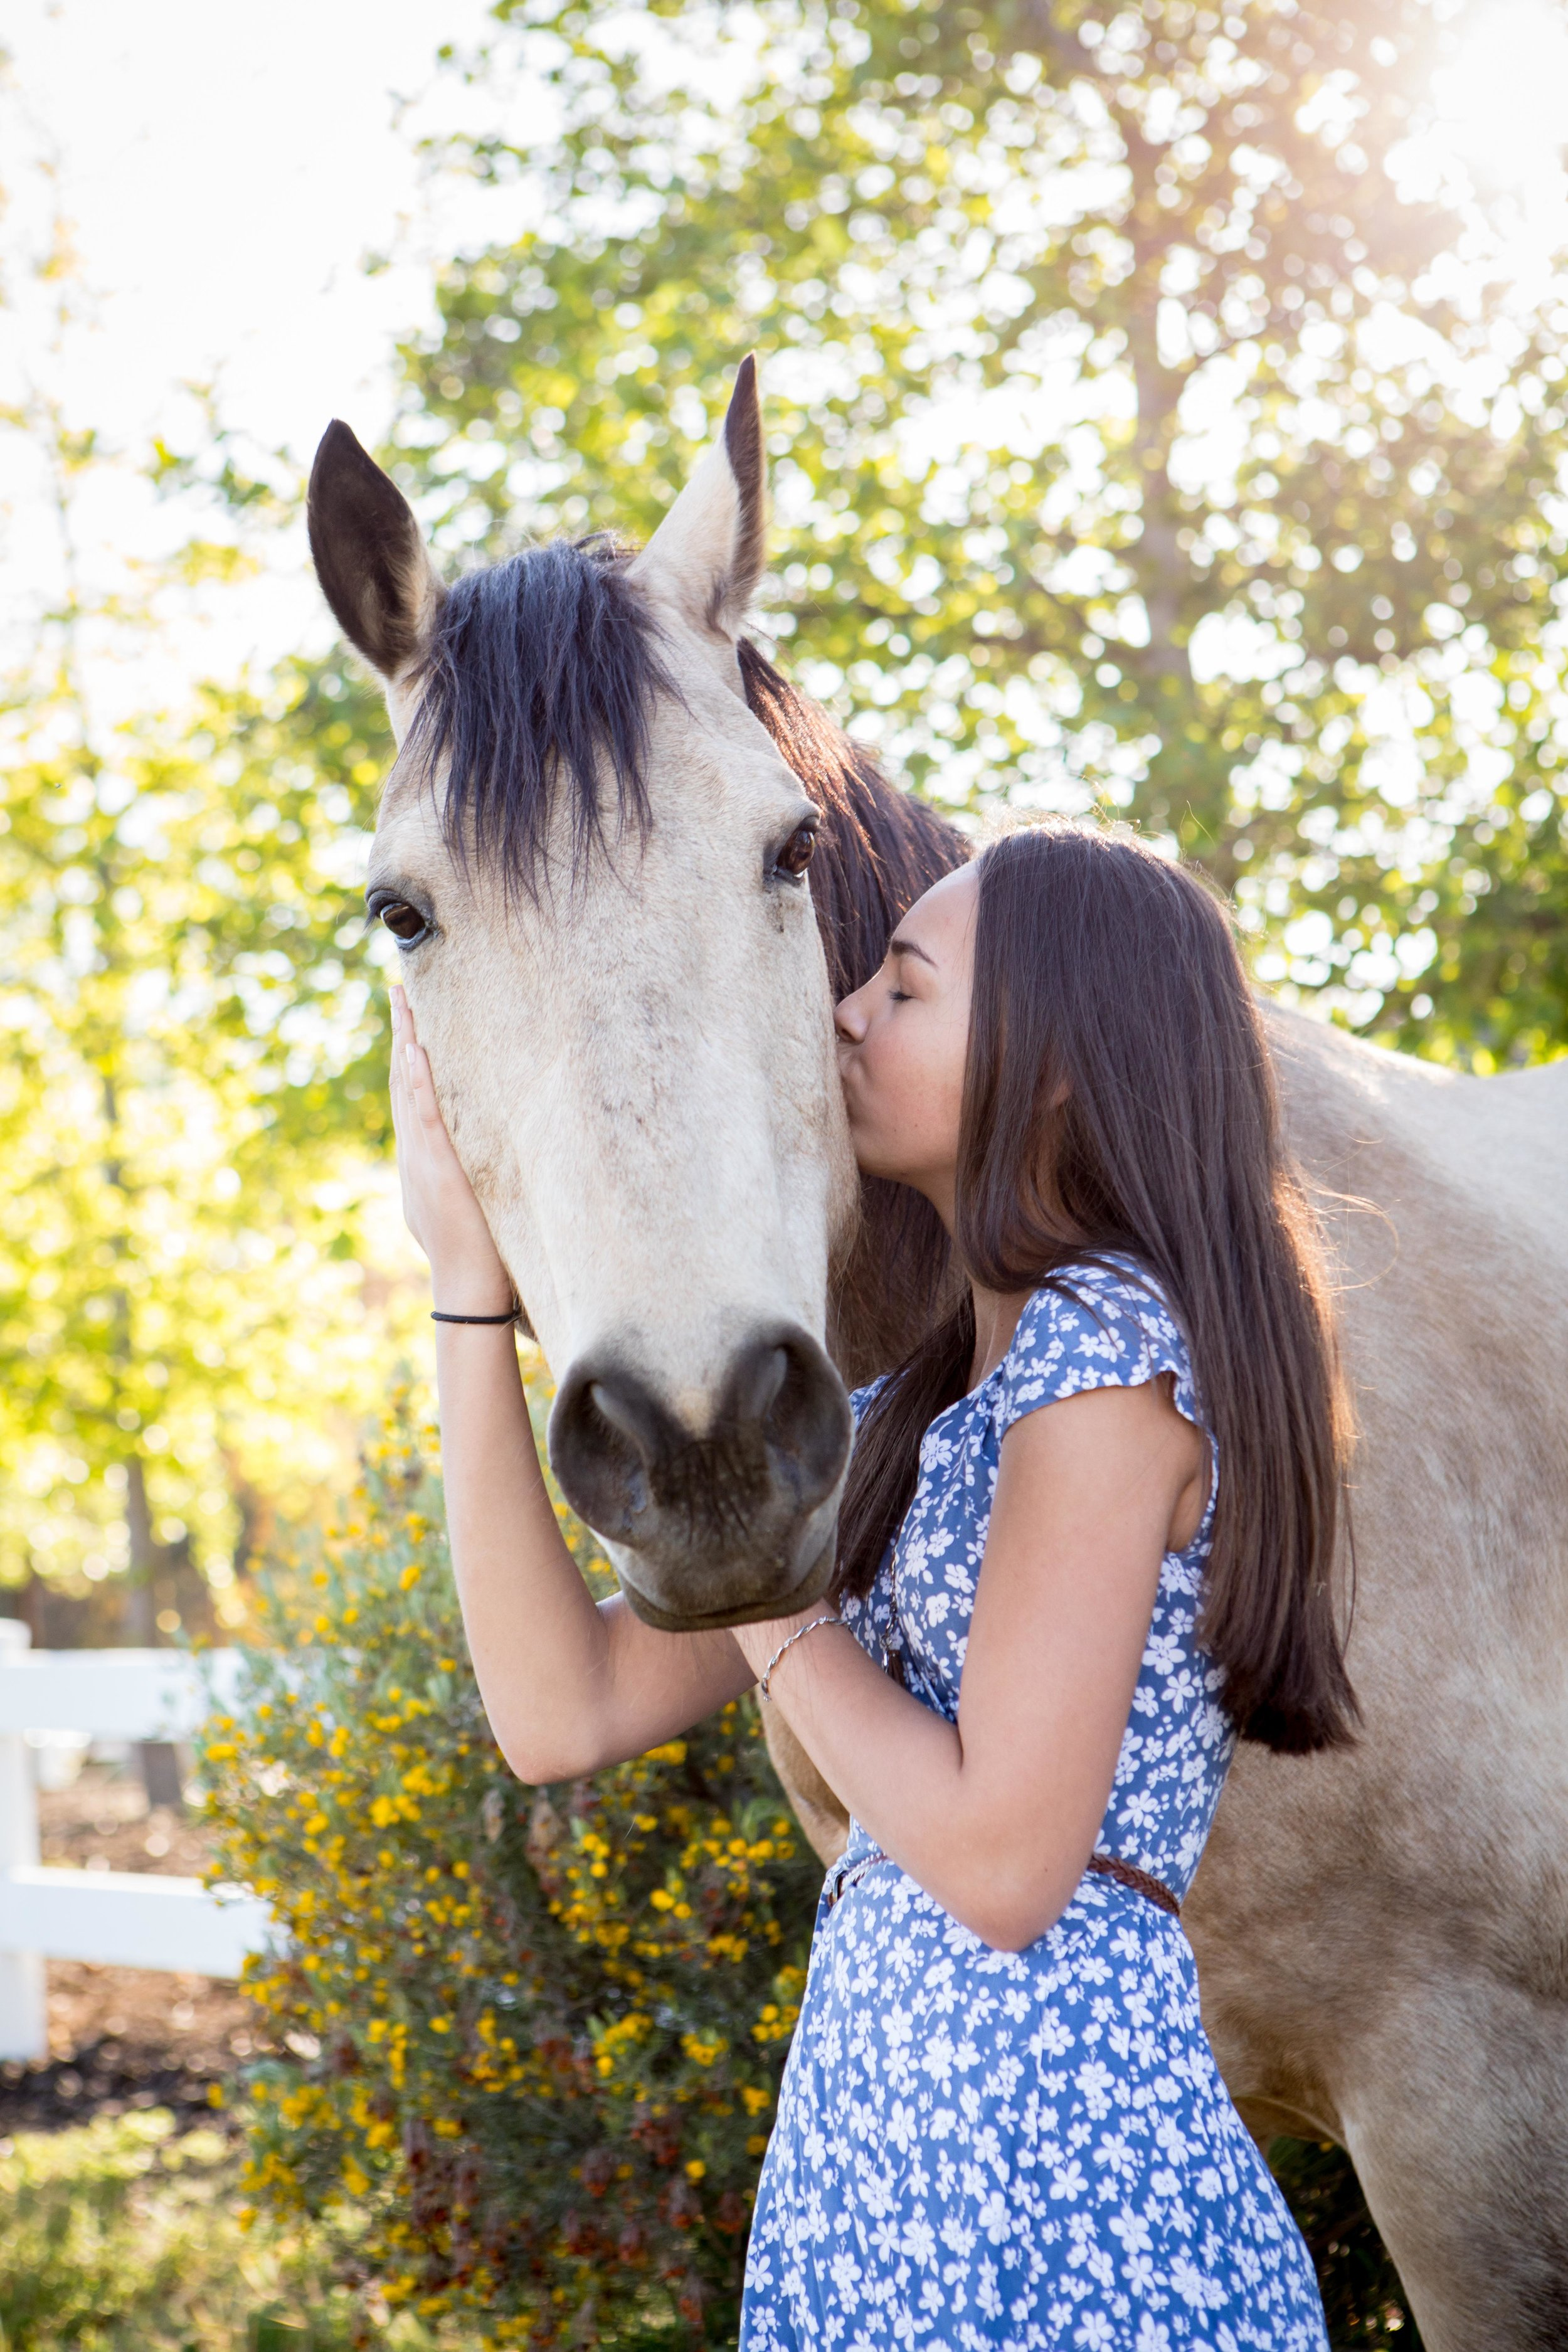 Equestrian portrait photography